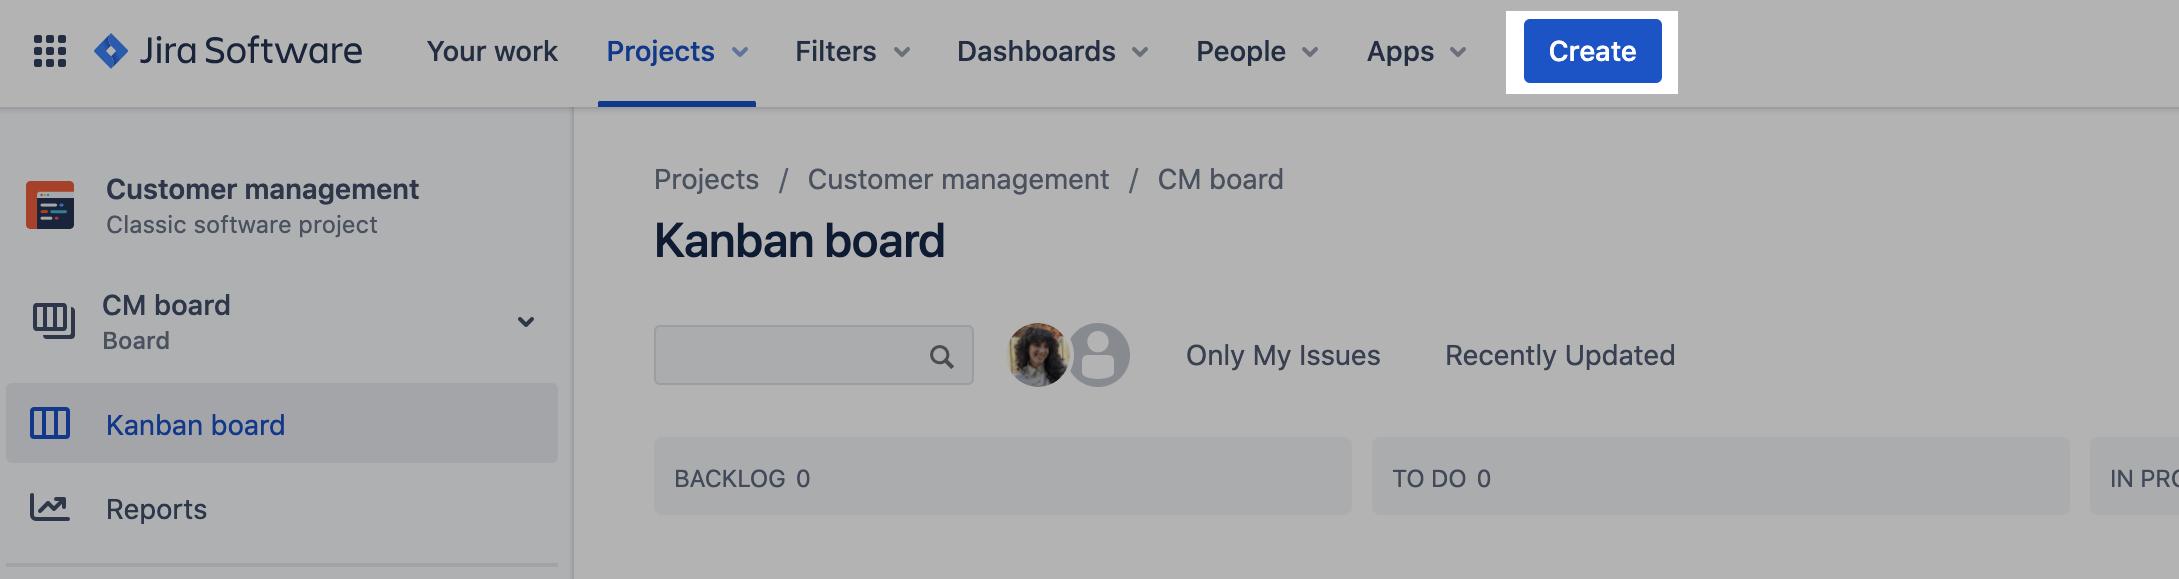 Captura de pantalla que destaca el botón para crear tickets de kanban